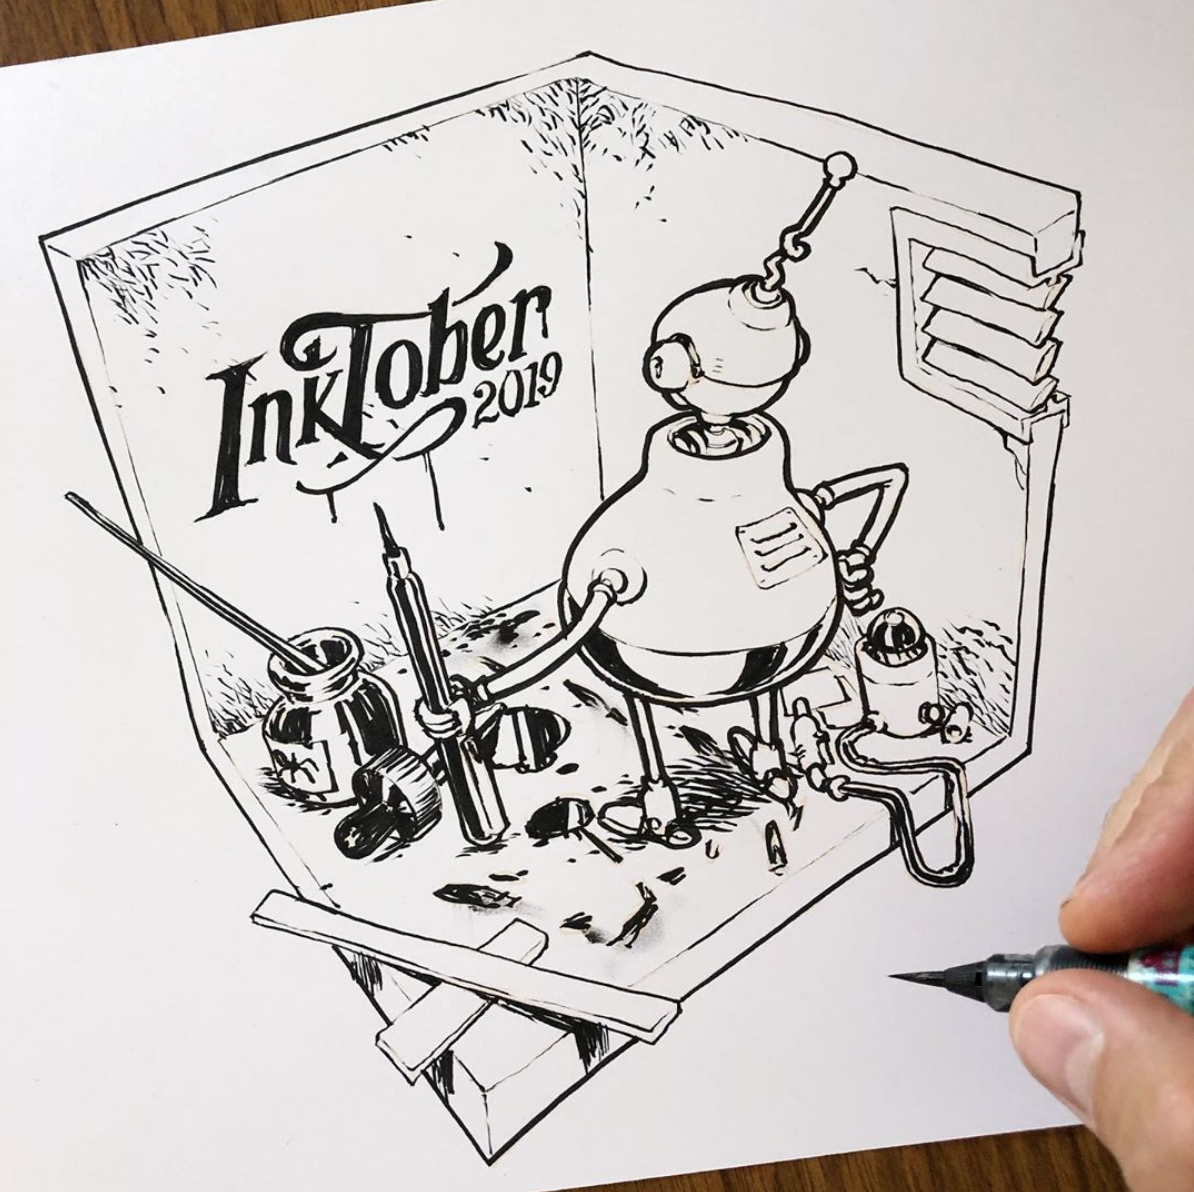 Art by Jake Parker, founder of Inktober.